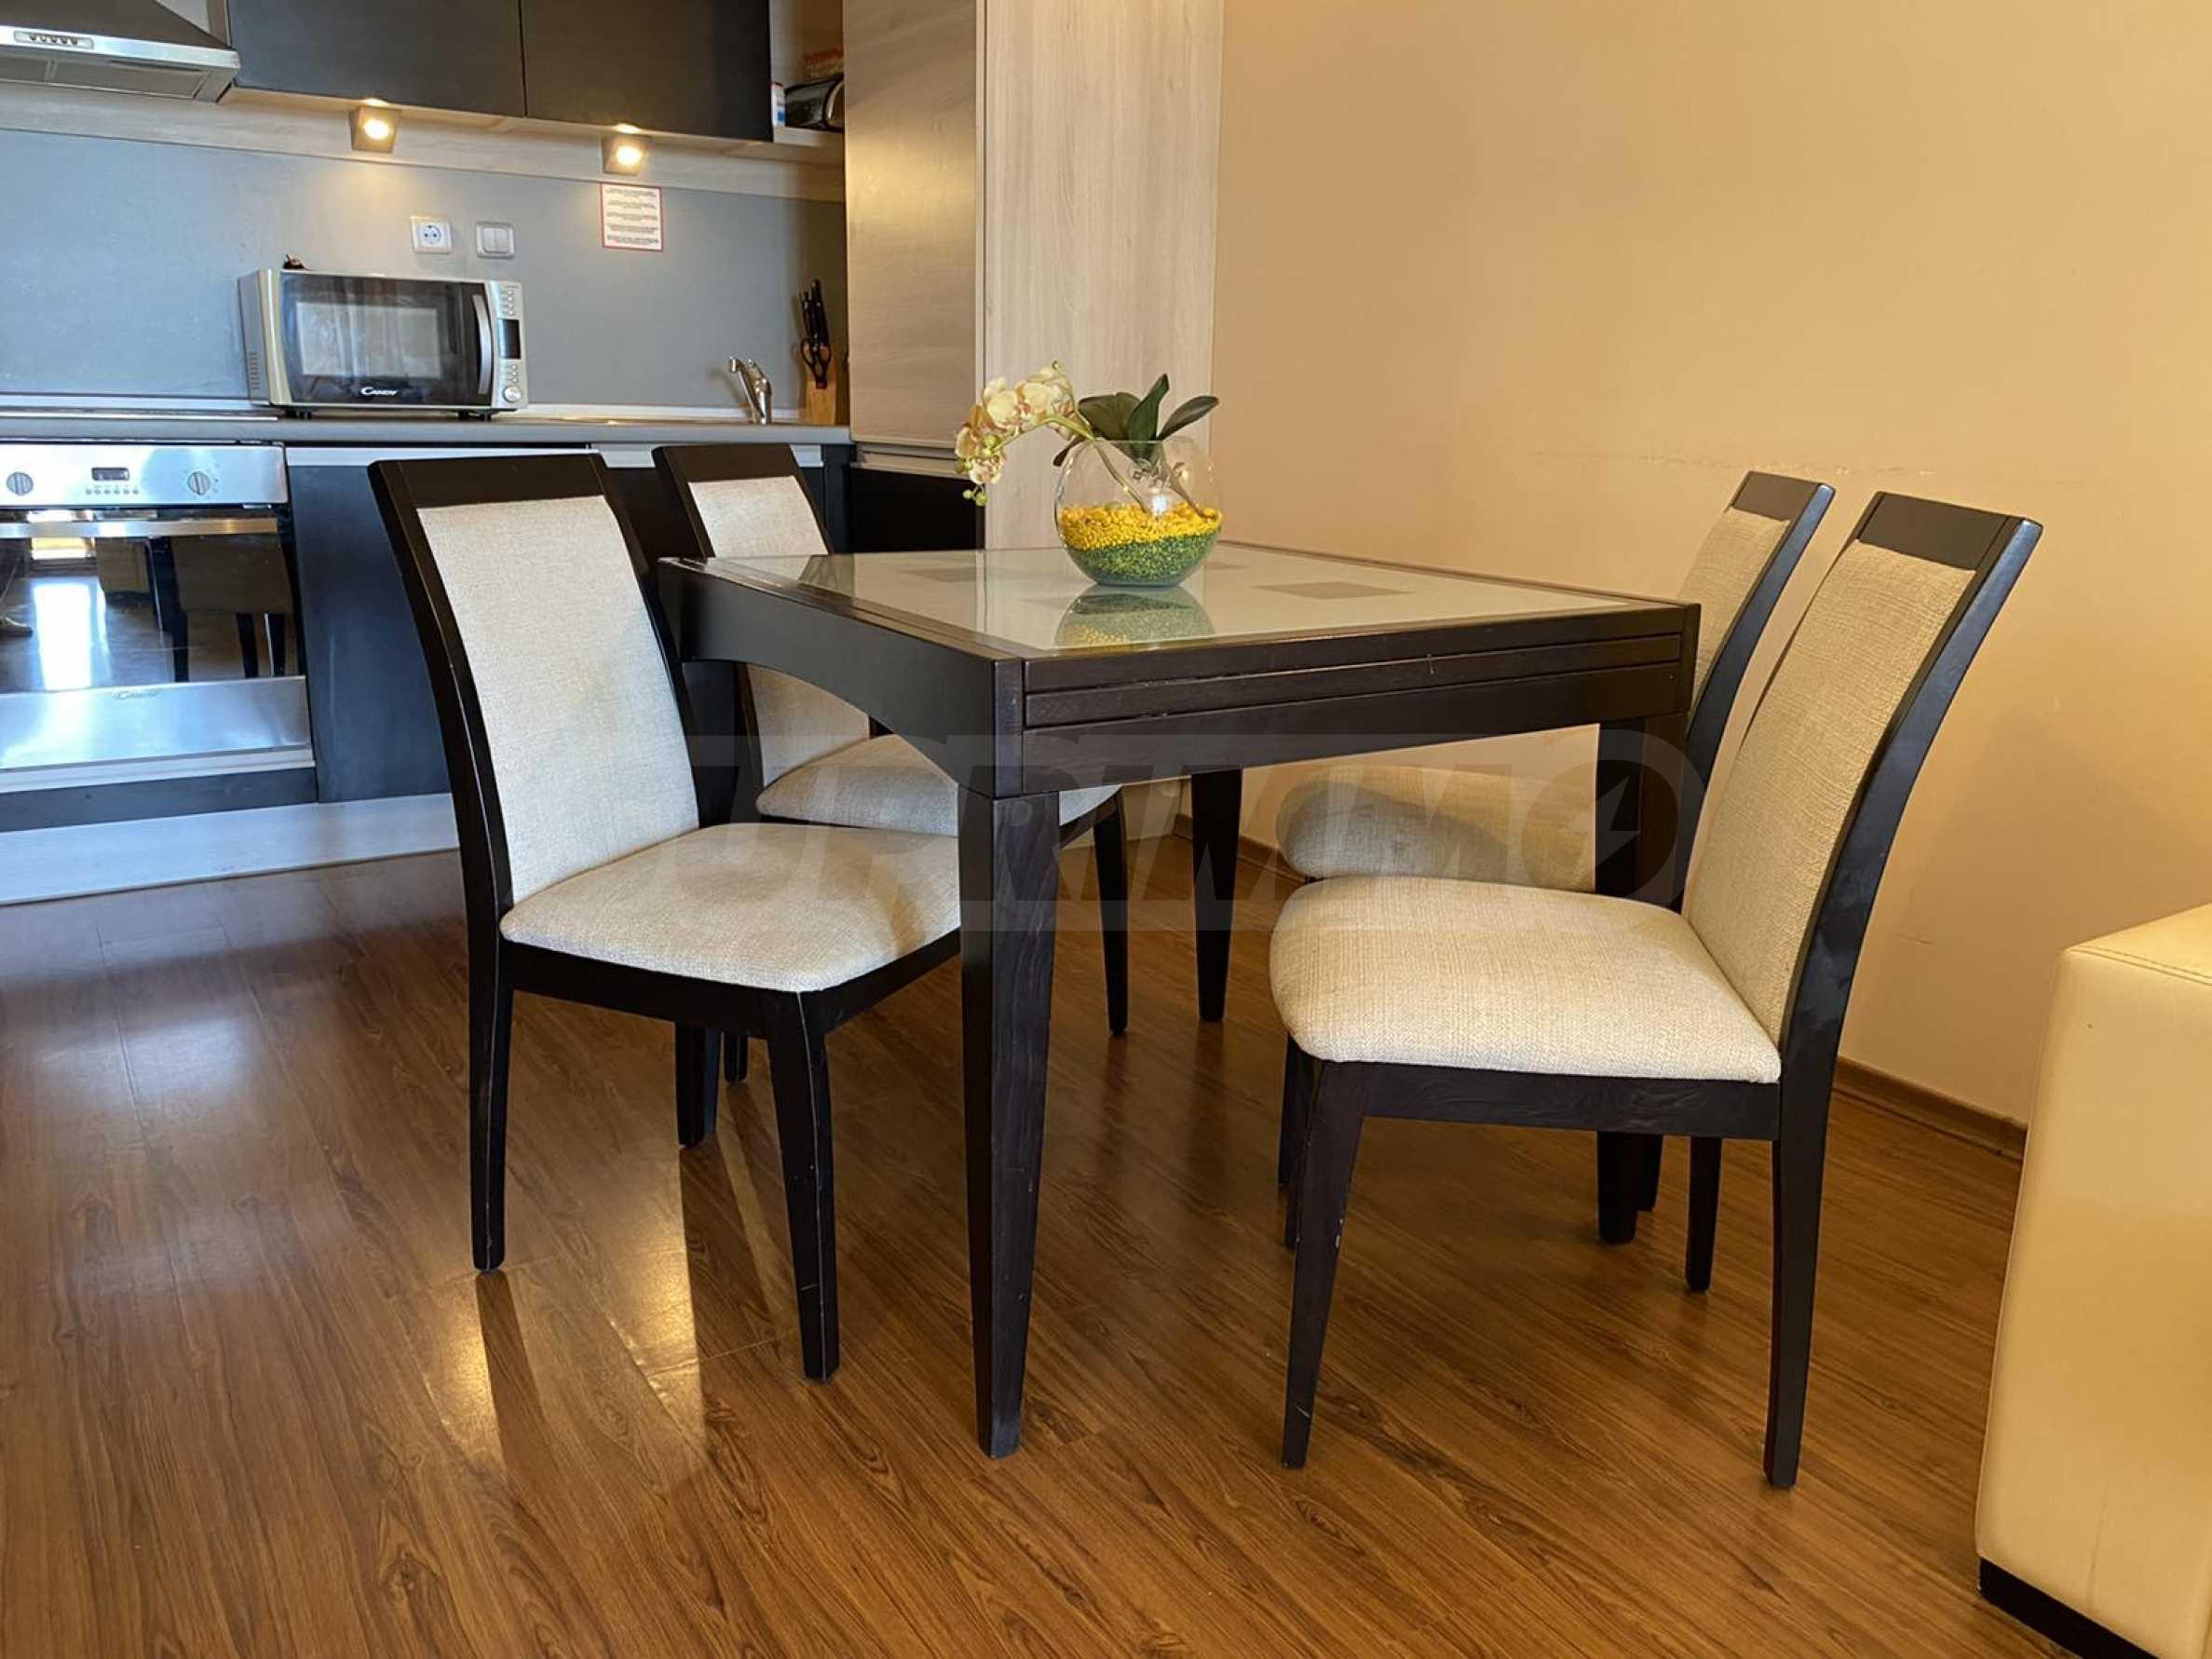 1-bedroom apartment Duralek  2